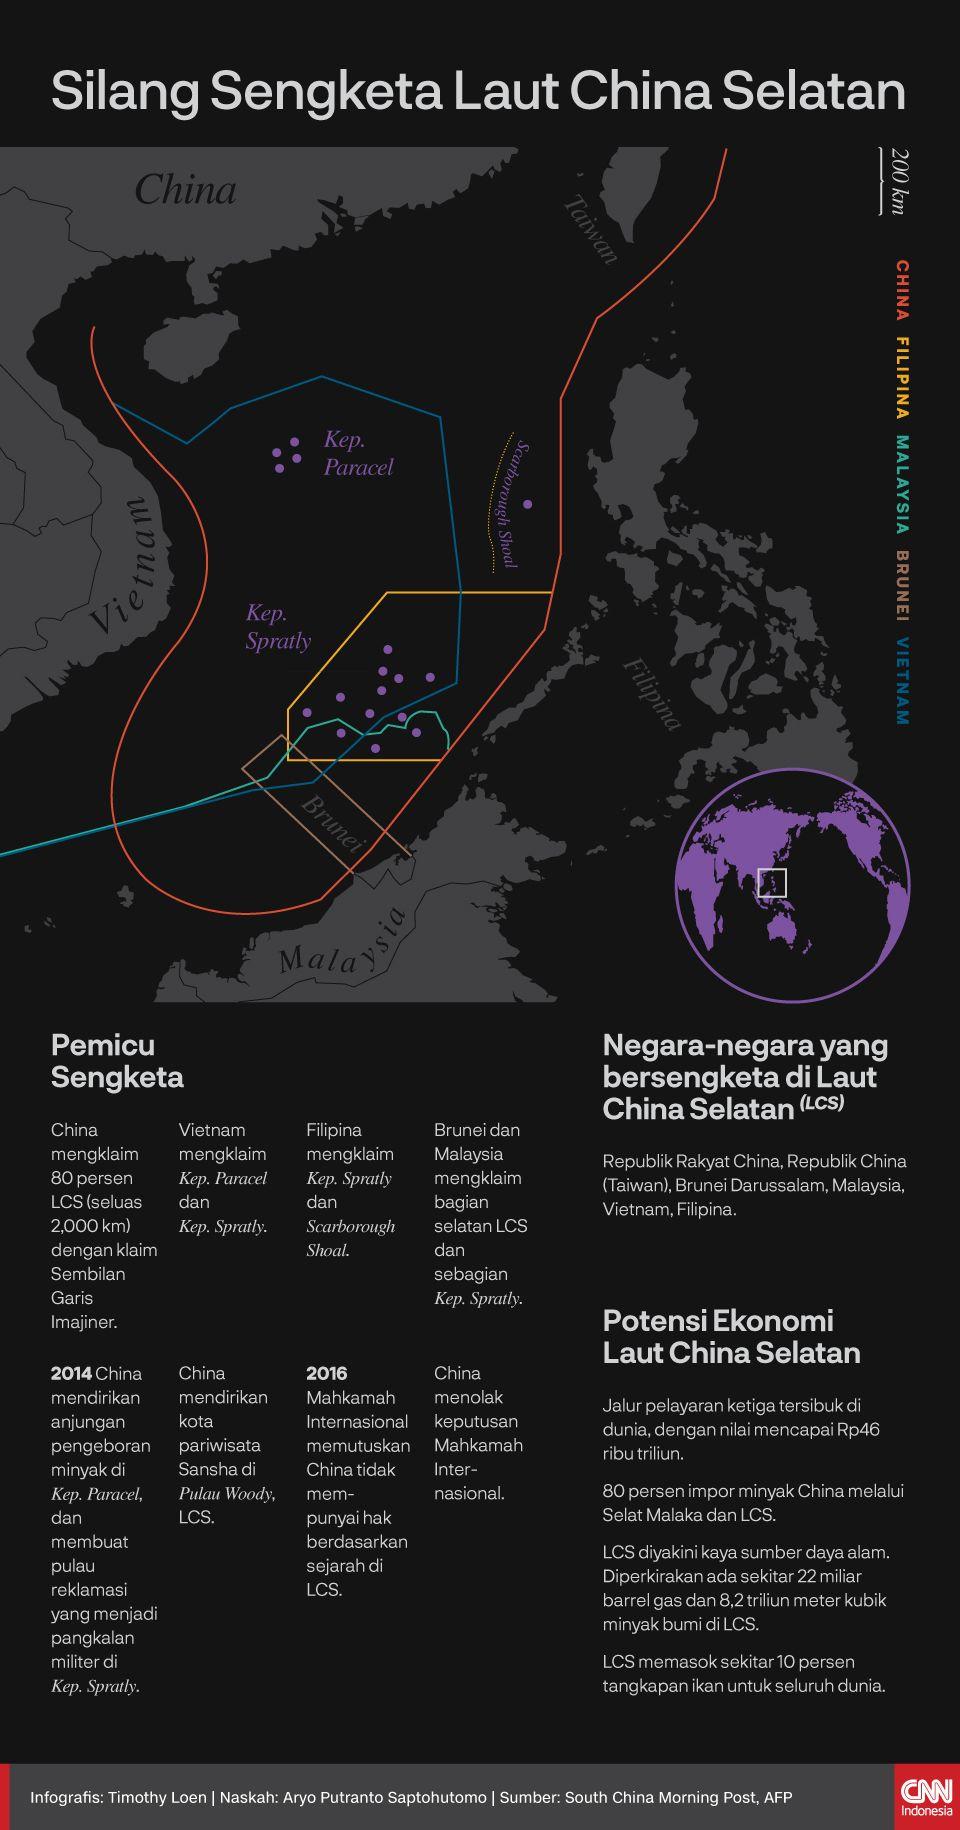 Silang Sengketa Laut China Selatan